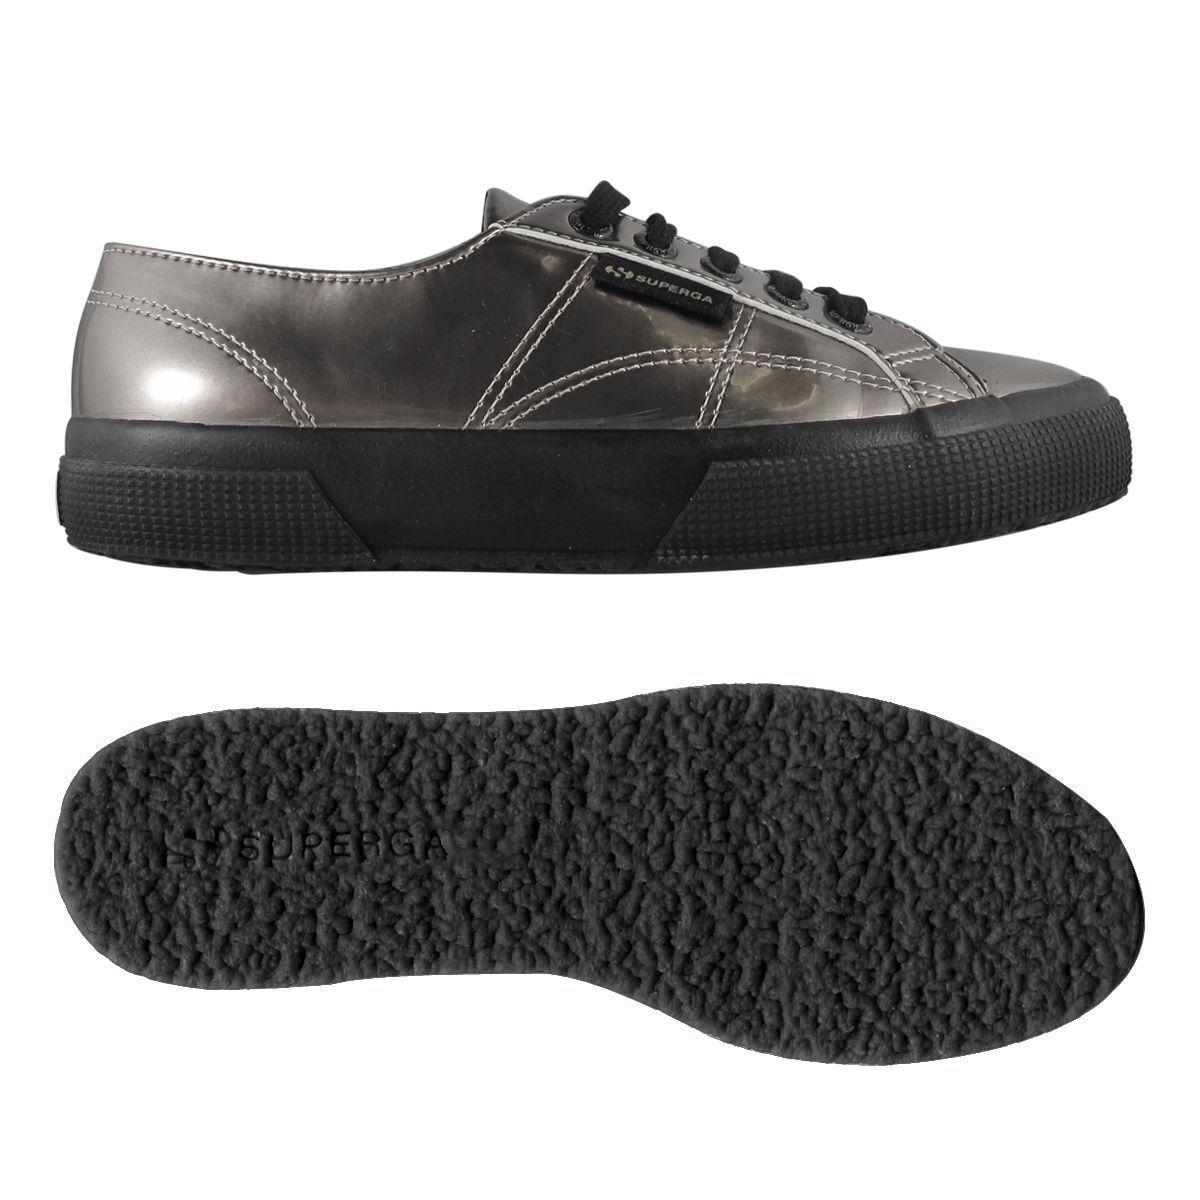 Superga Schuhe ginnastica 2750-VARNISHMIRRORW Damenschuhe Chic Sneaker